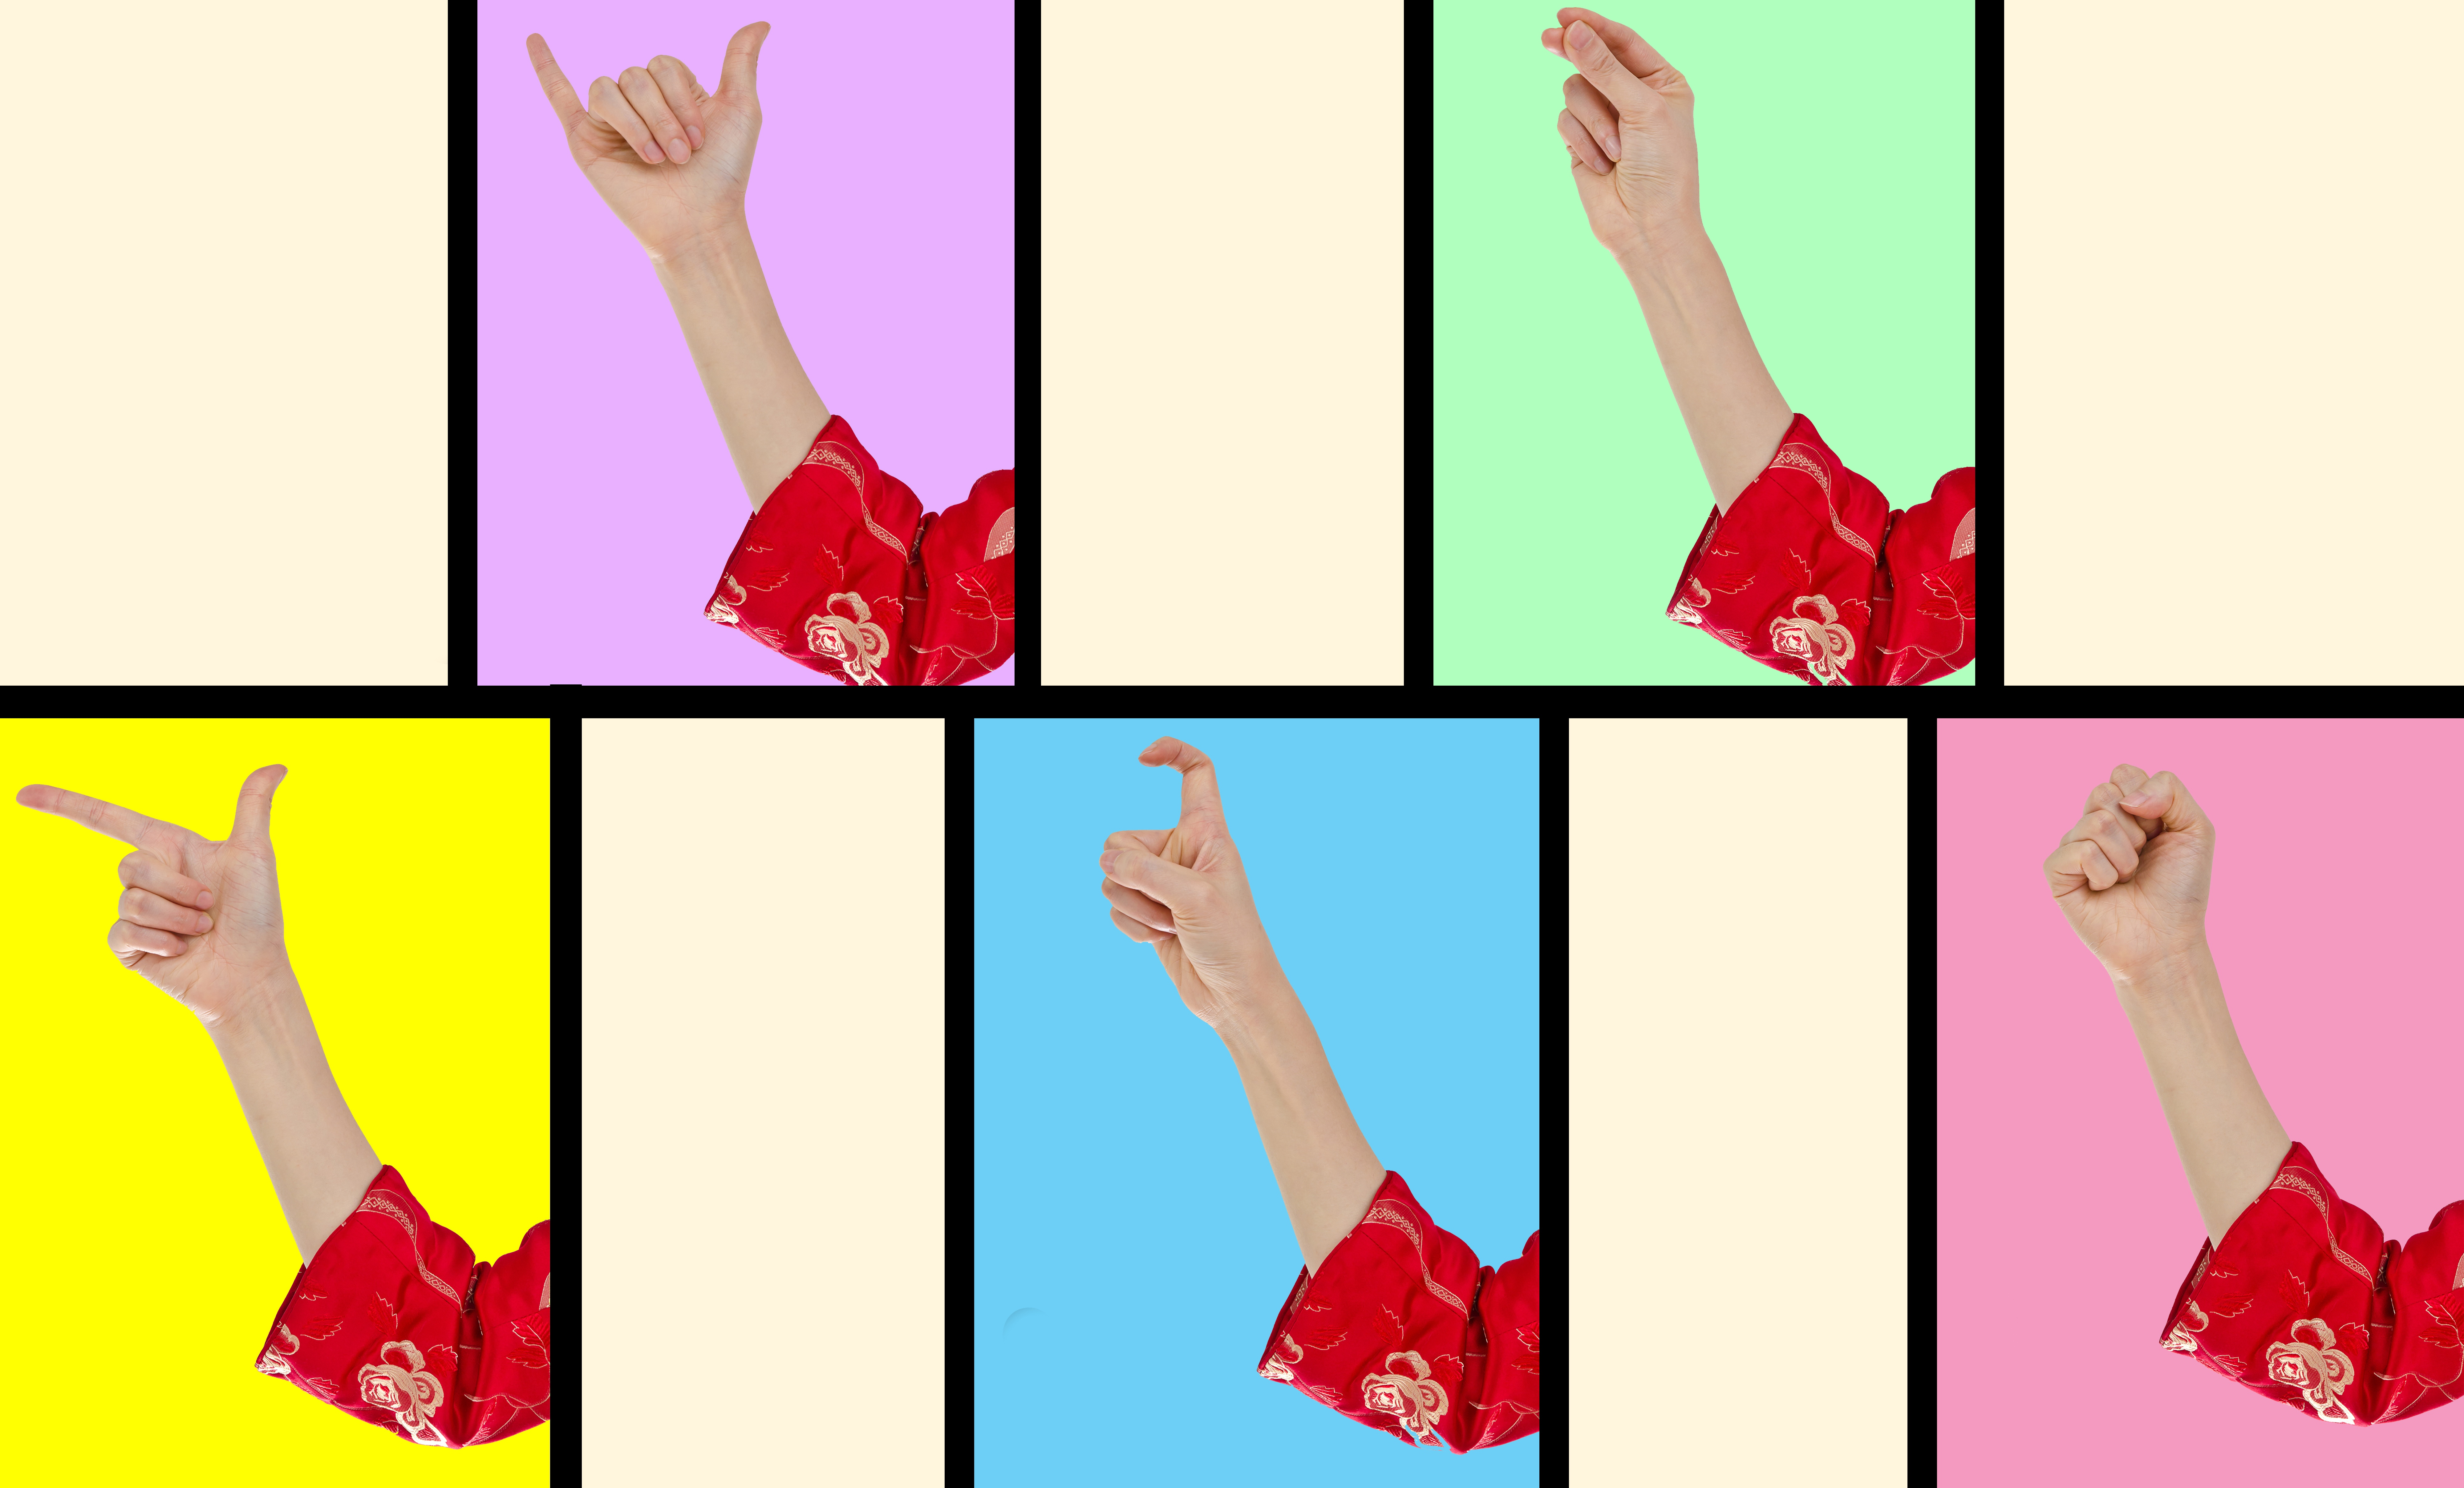 hand_number_symbols.jpg